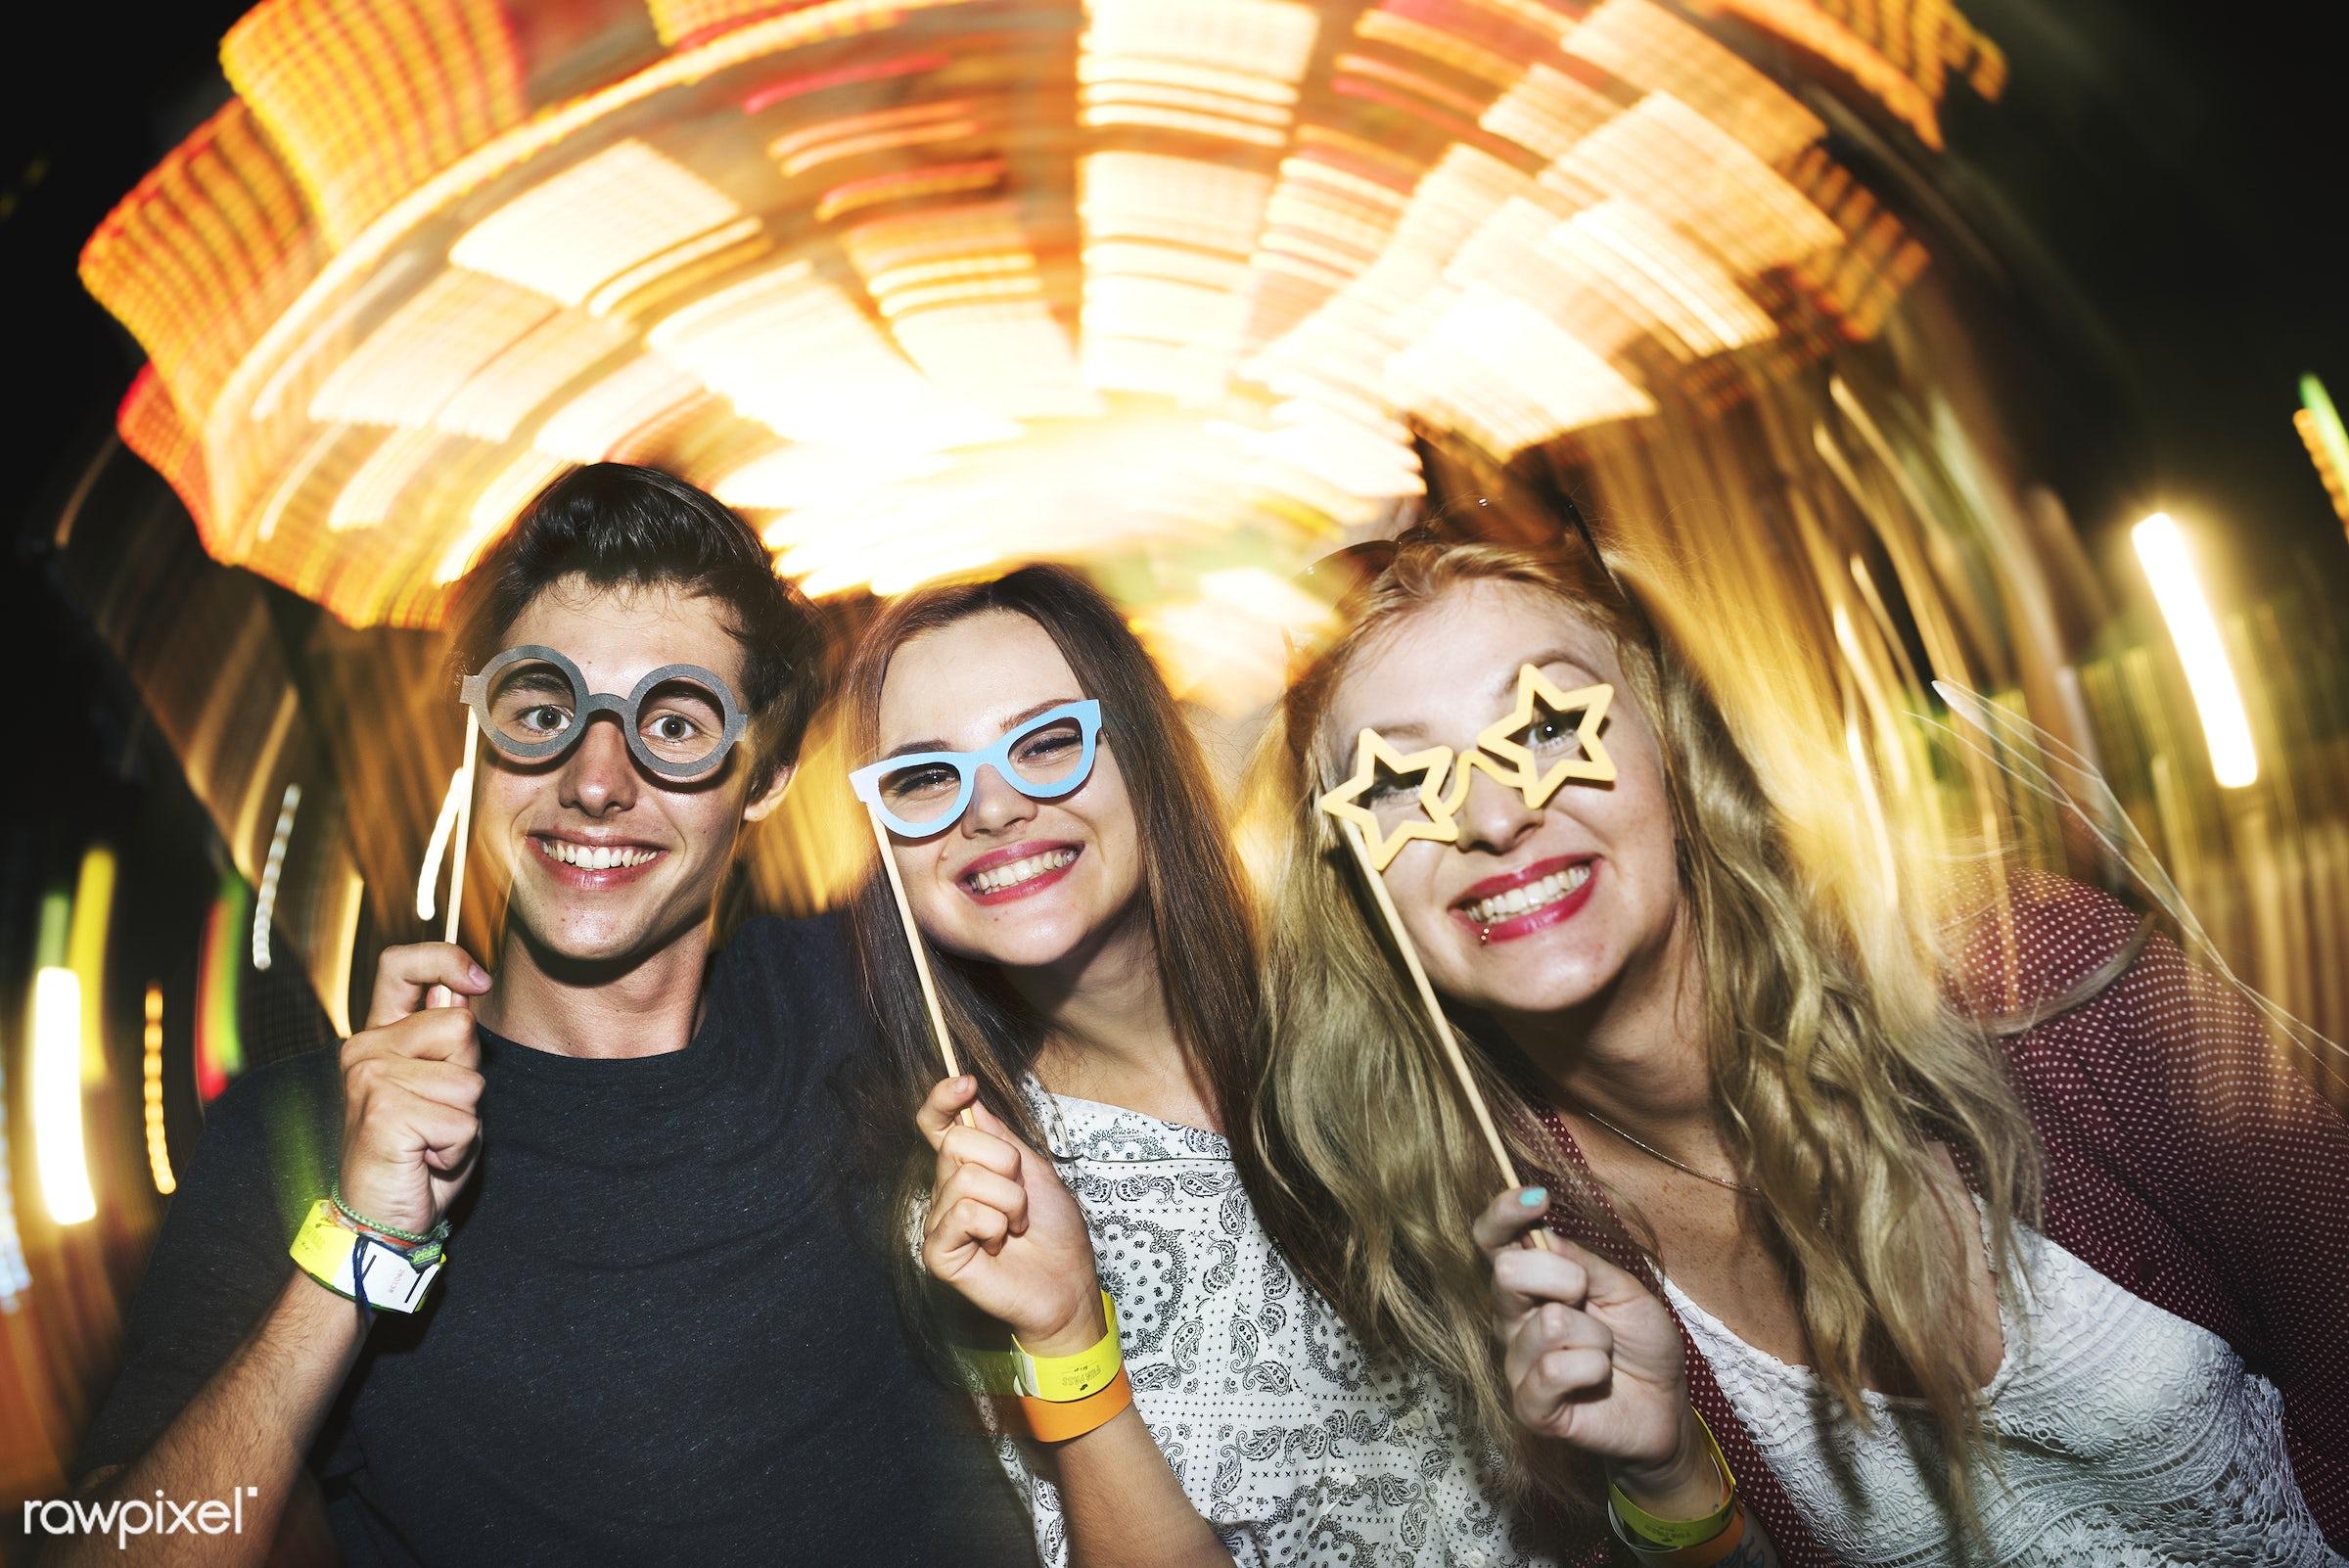 costume, amusement park, caucasian, enjoyment, expression, eyeglasses, feeling, friends, friendship, fun, fun park, group,...